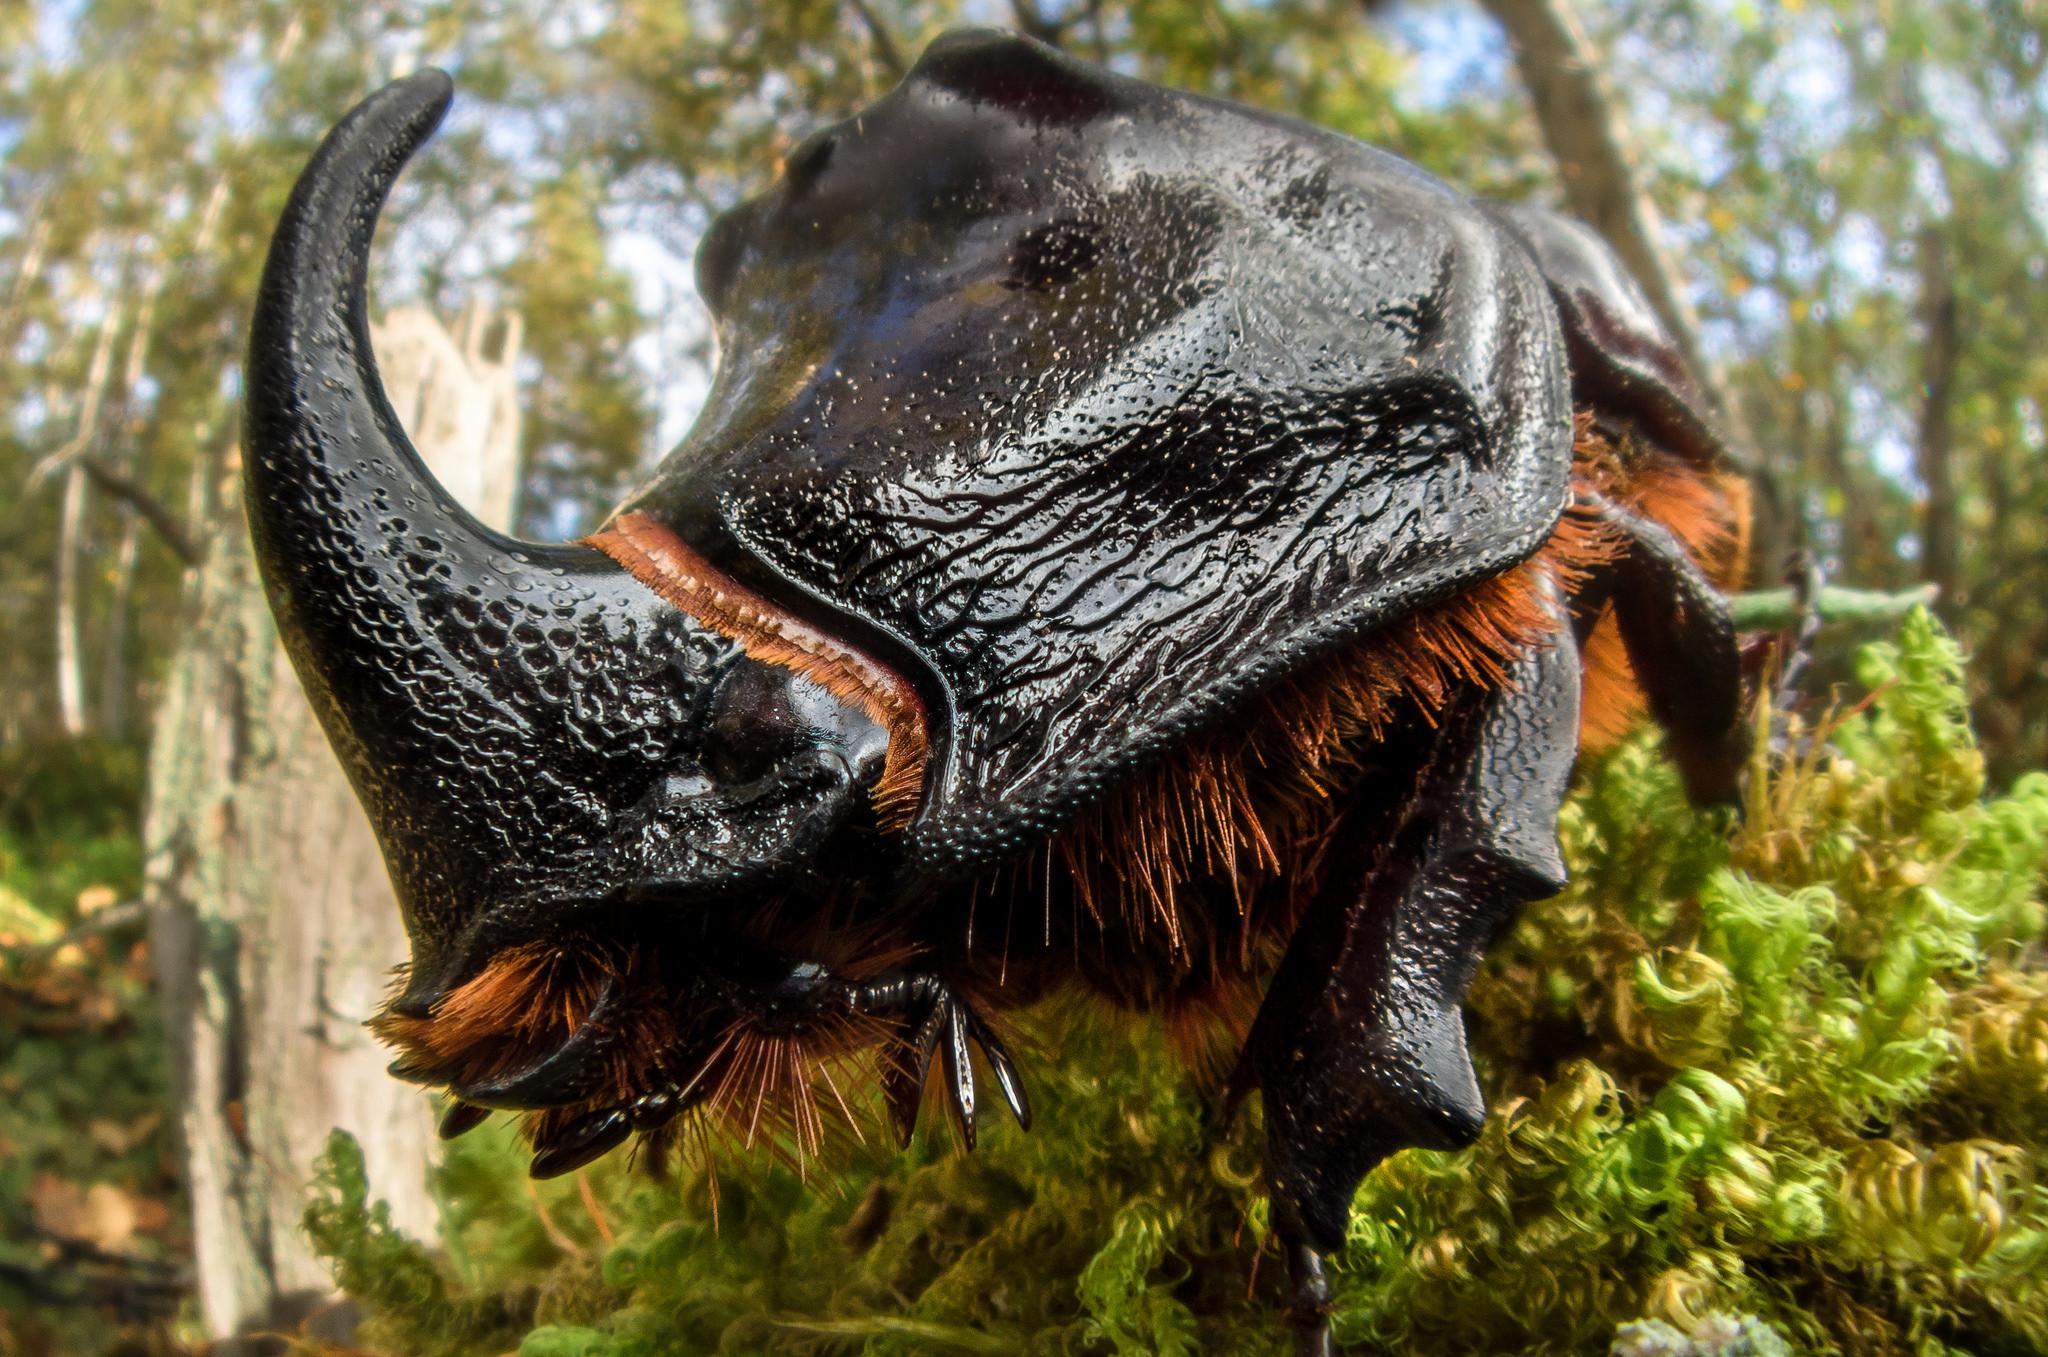 Жук-носорог в макросъёмке шведского фотографа John Hallmеn